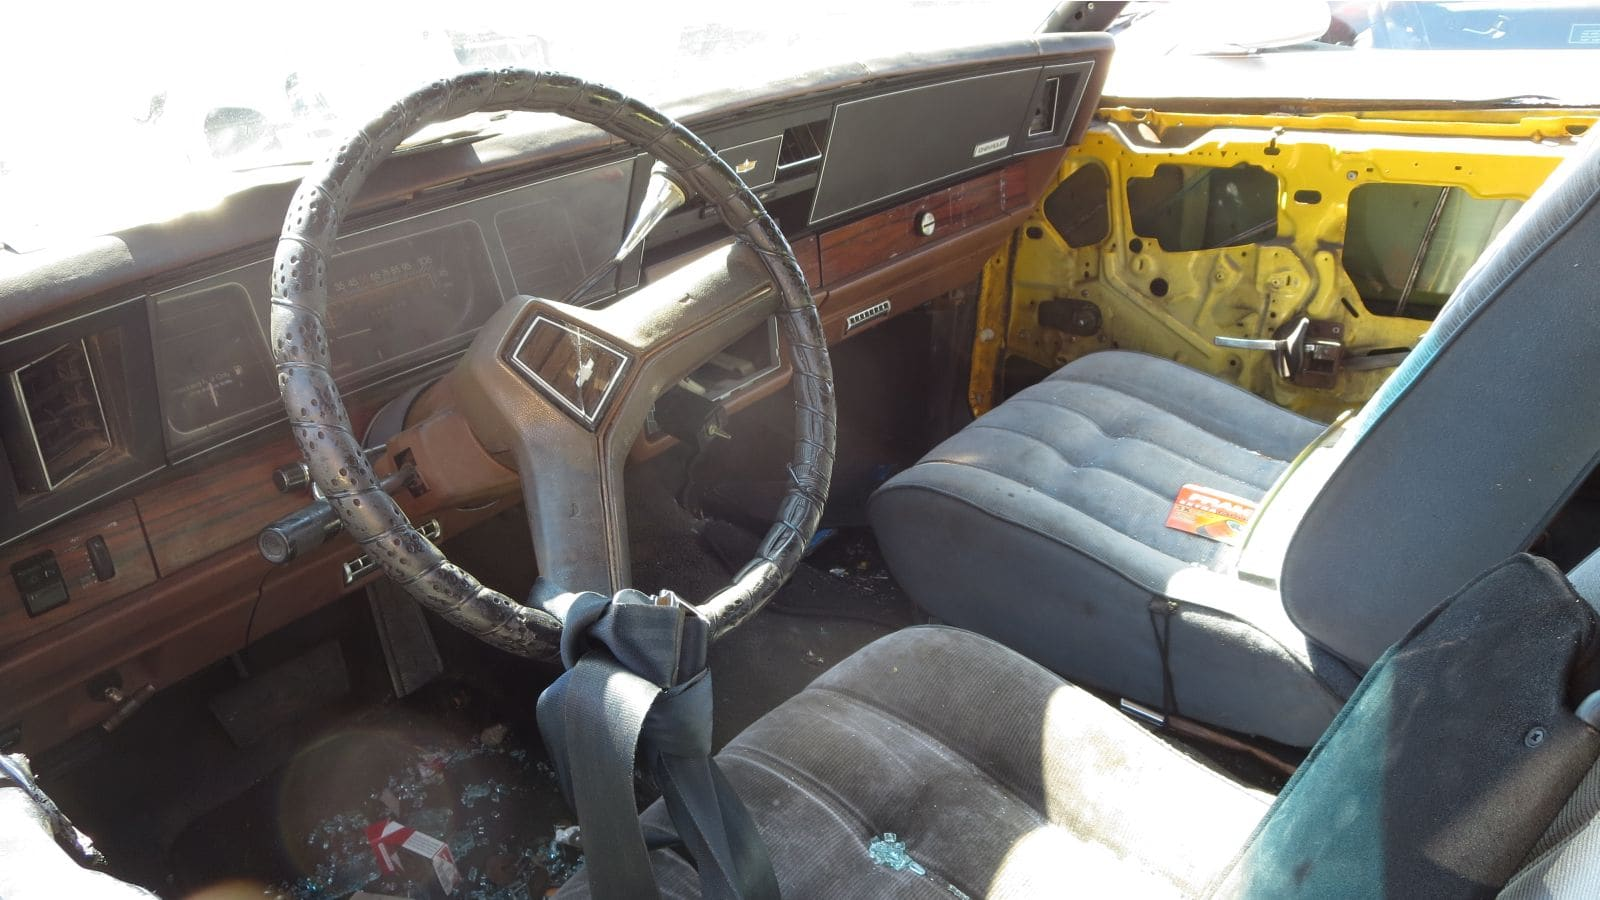 Junked 1990 Chevrolet Caprice